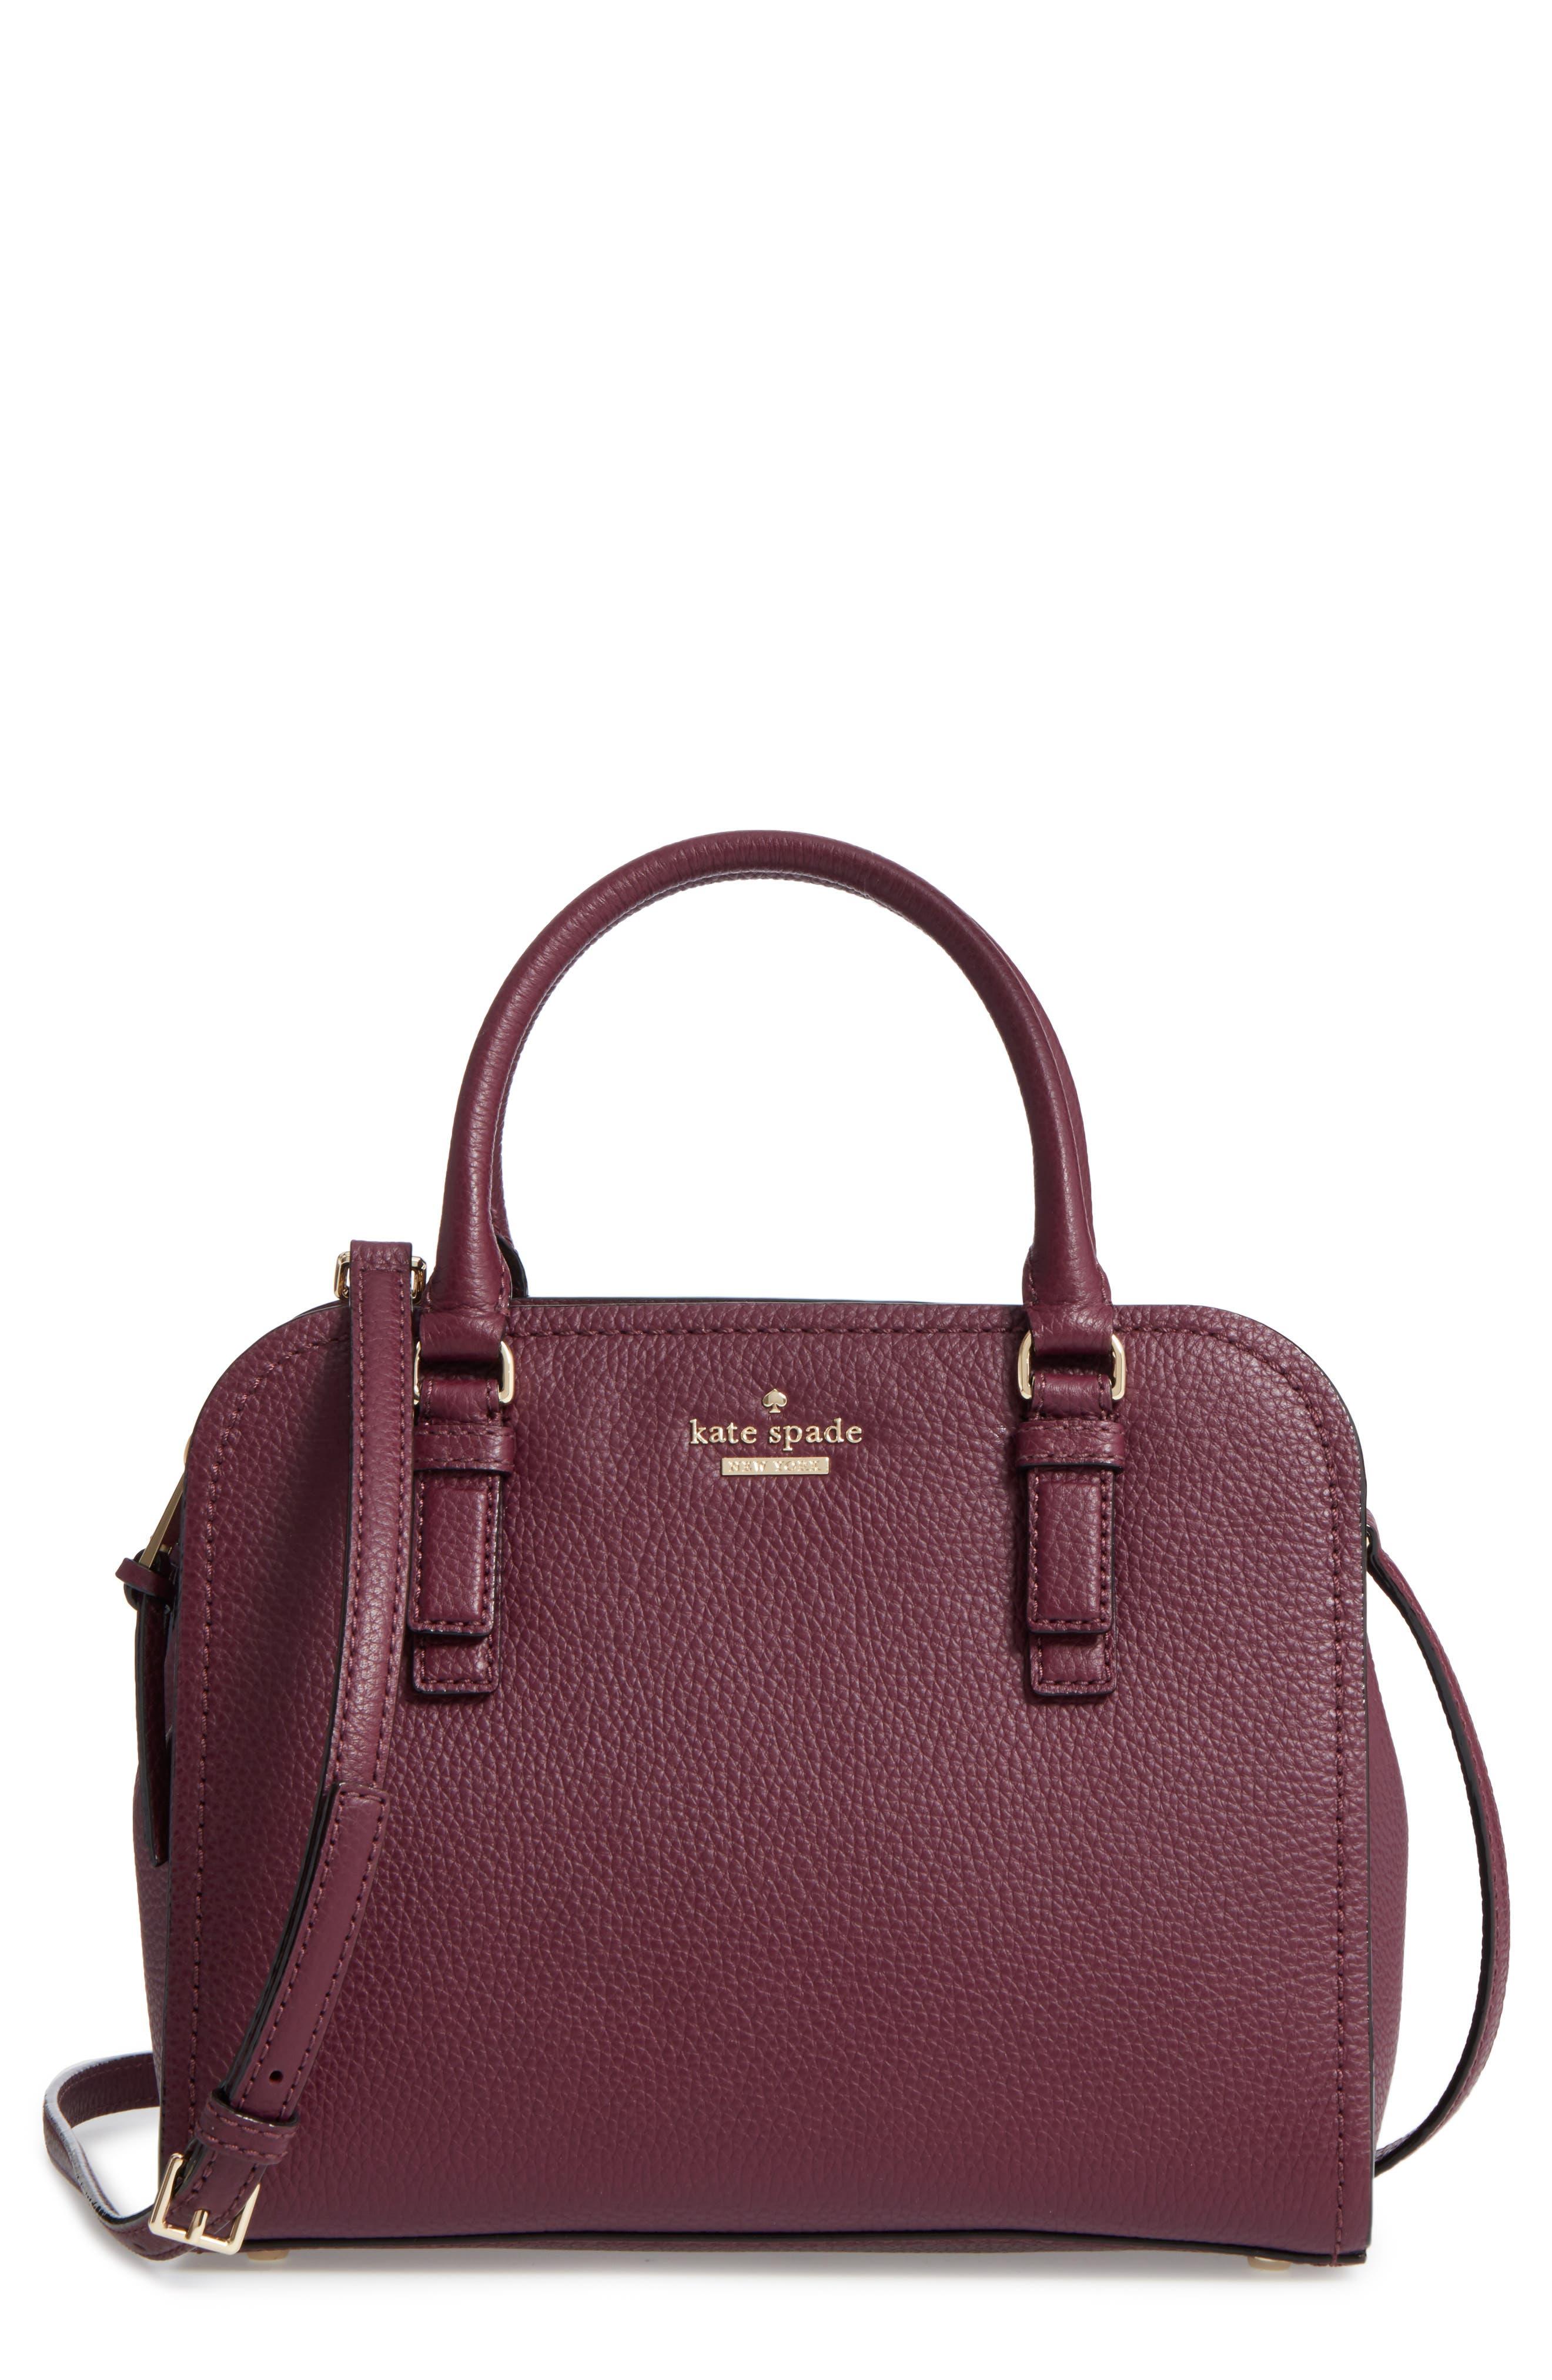 jackson street small kiernan leather top handle satchel,                             Main thumbnail 1, color,                             545